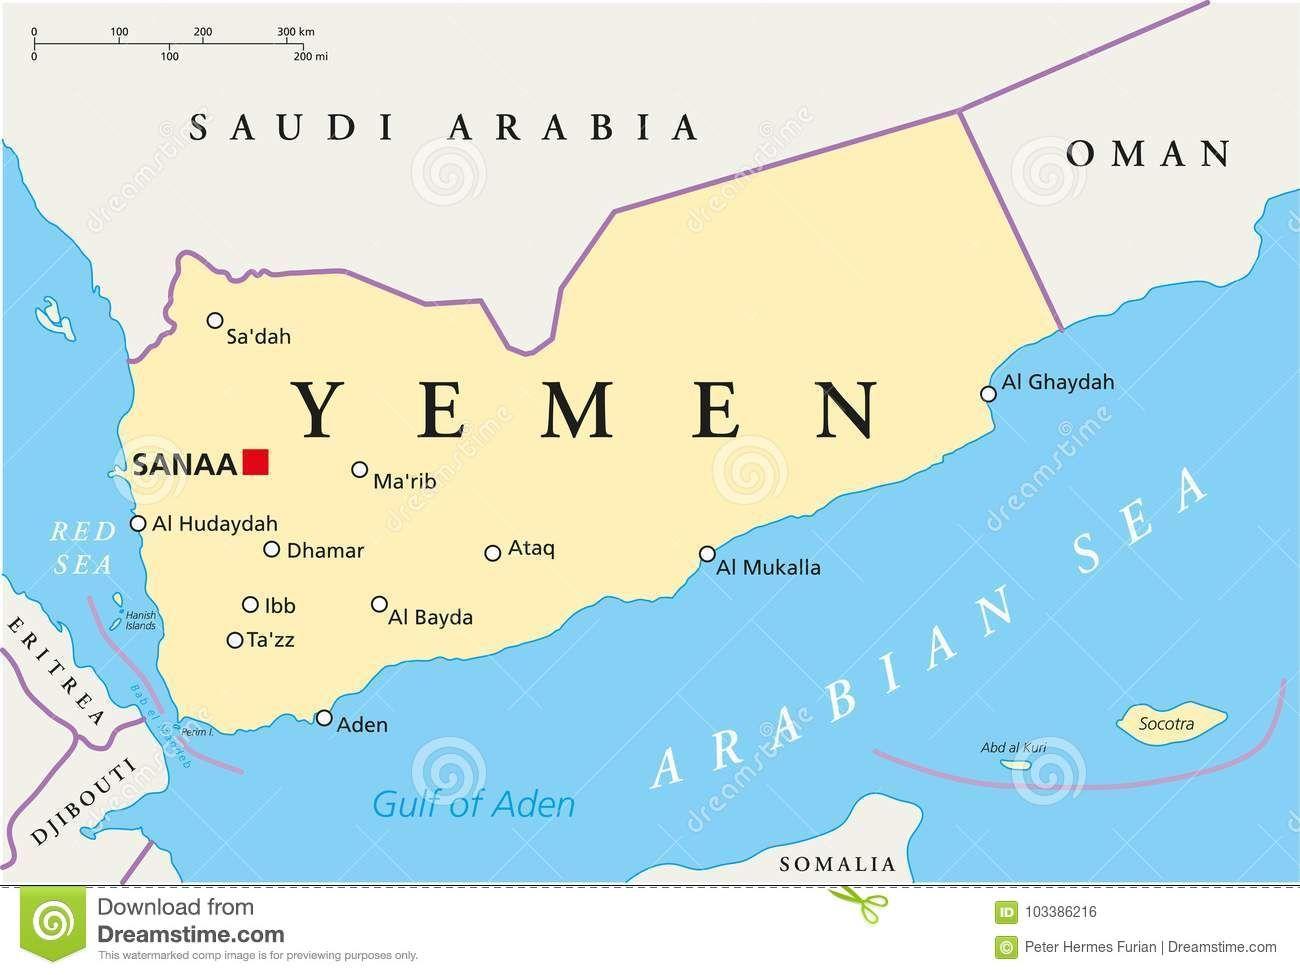 Der Jemen Politische Karte Vektor Abbildung Illustration Yemen Jemen Map Sanaa Karte Politische Capital Political War Debat In 2020 Yemen Socotra South African